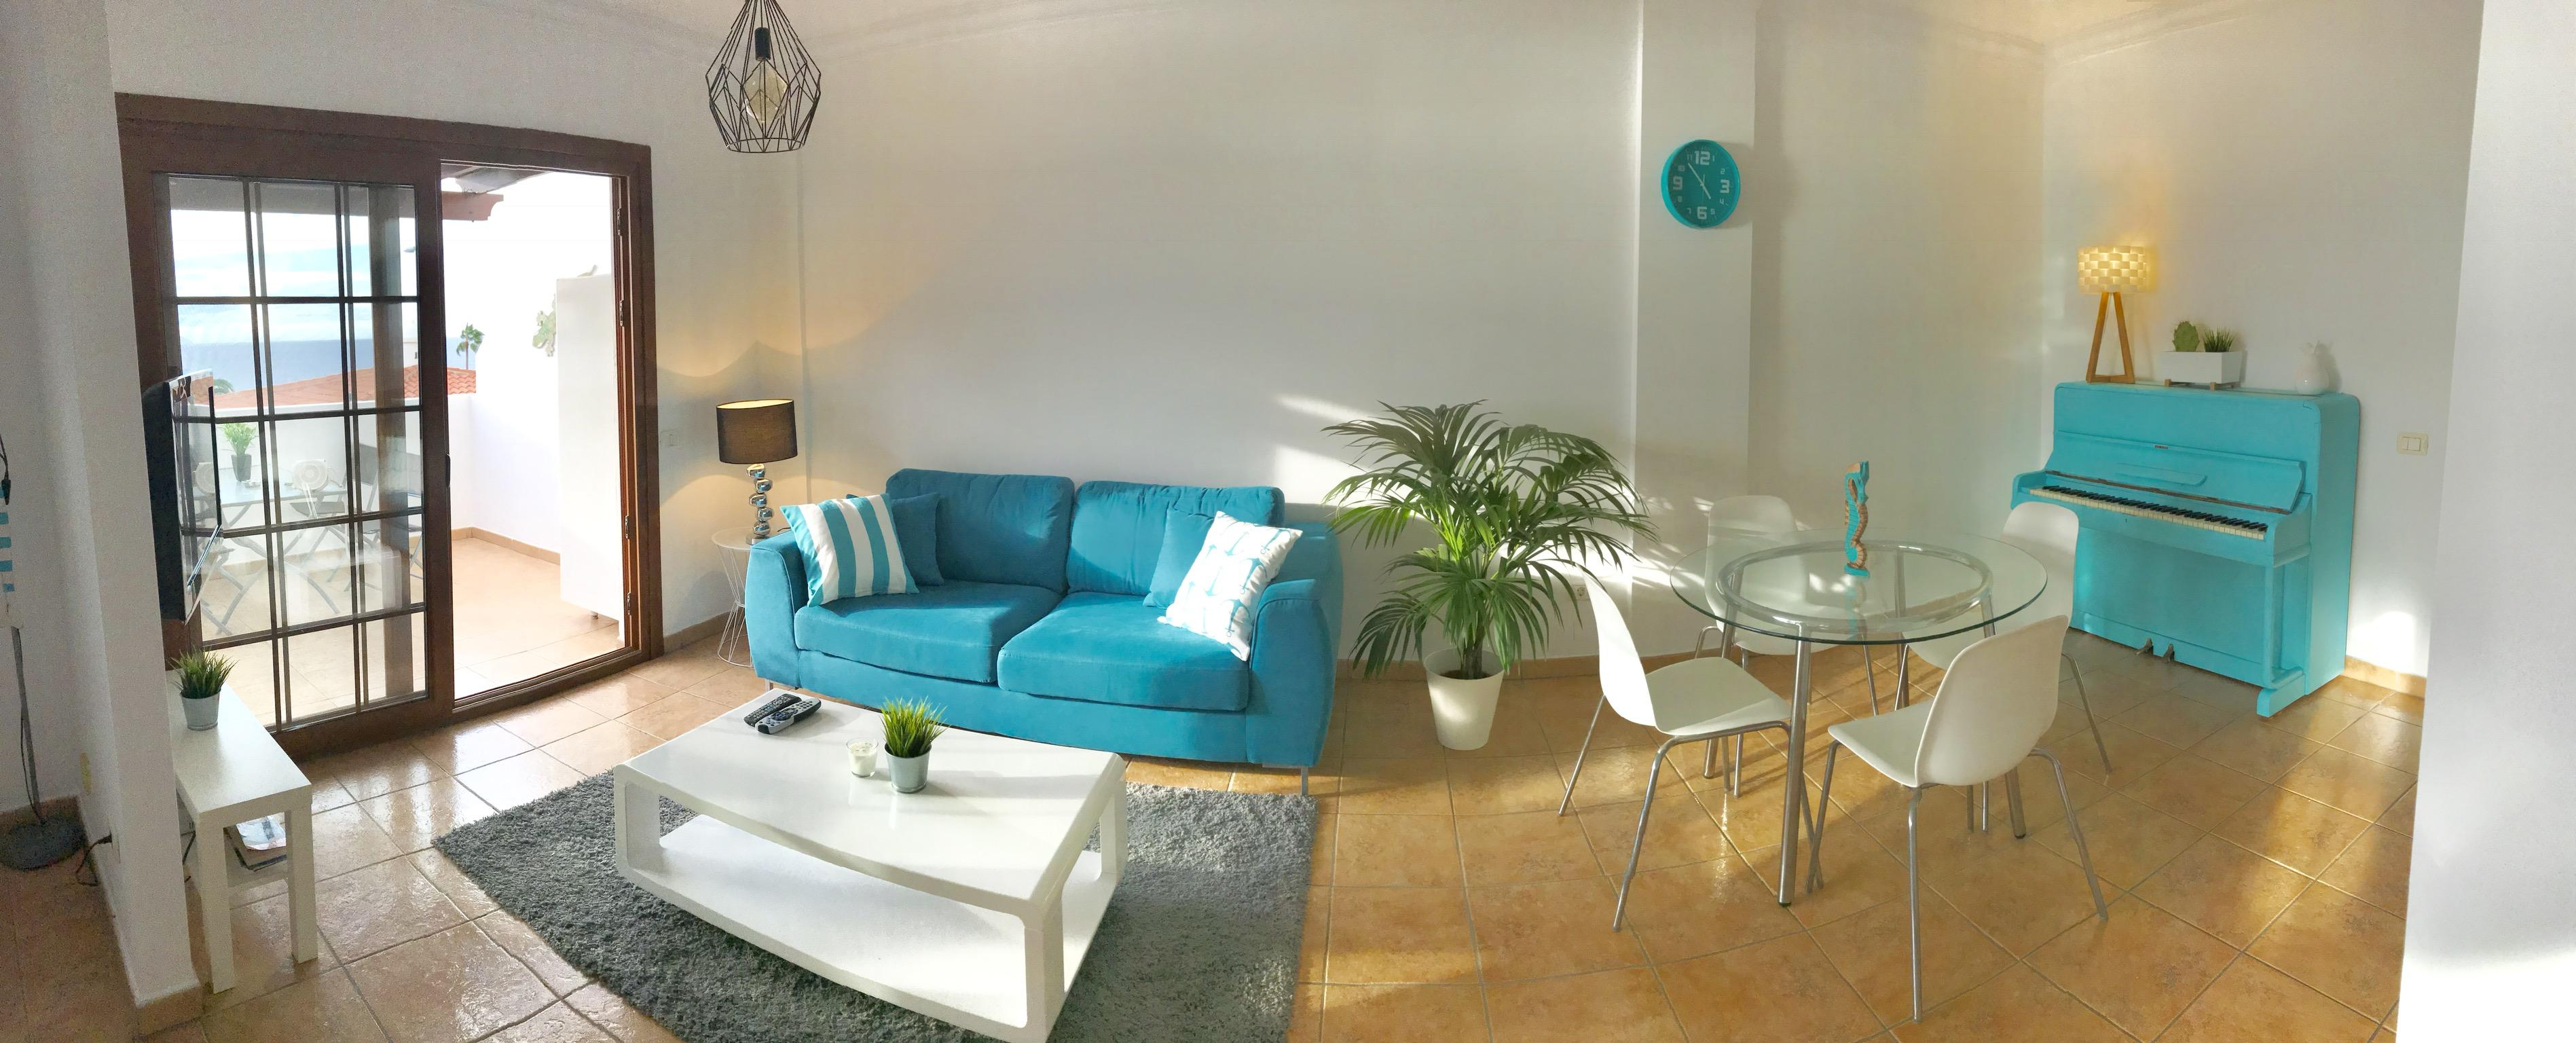 Appartement - Playa de la Arena - Elita